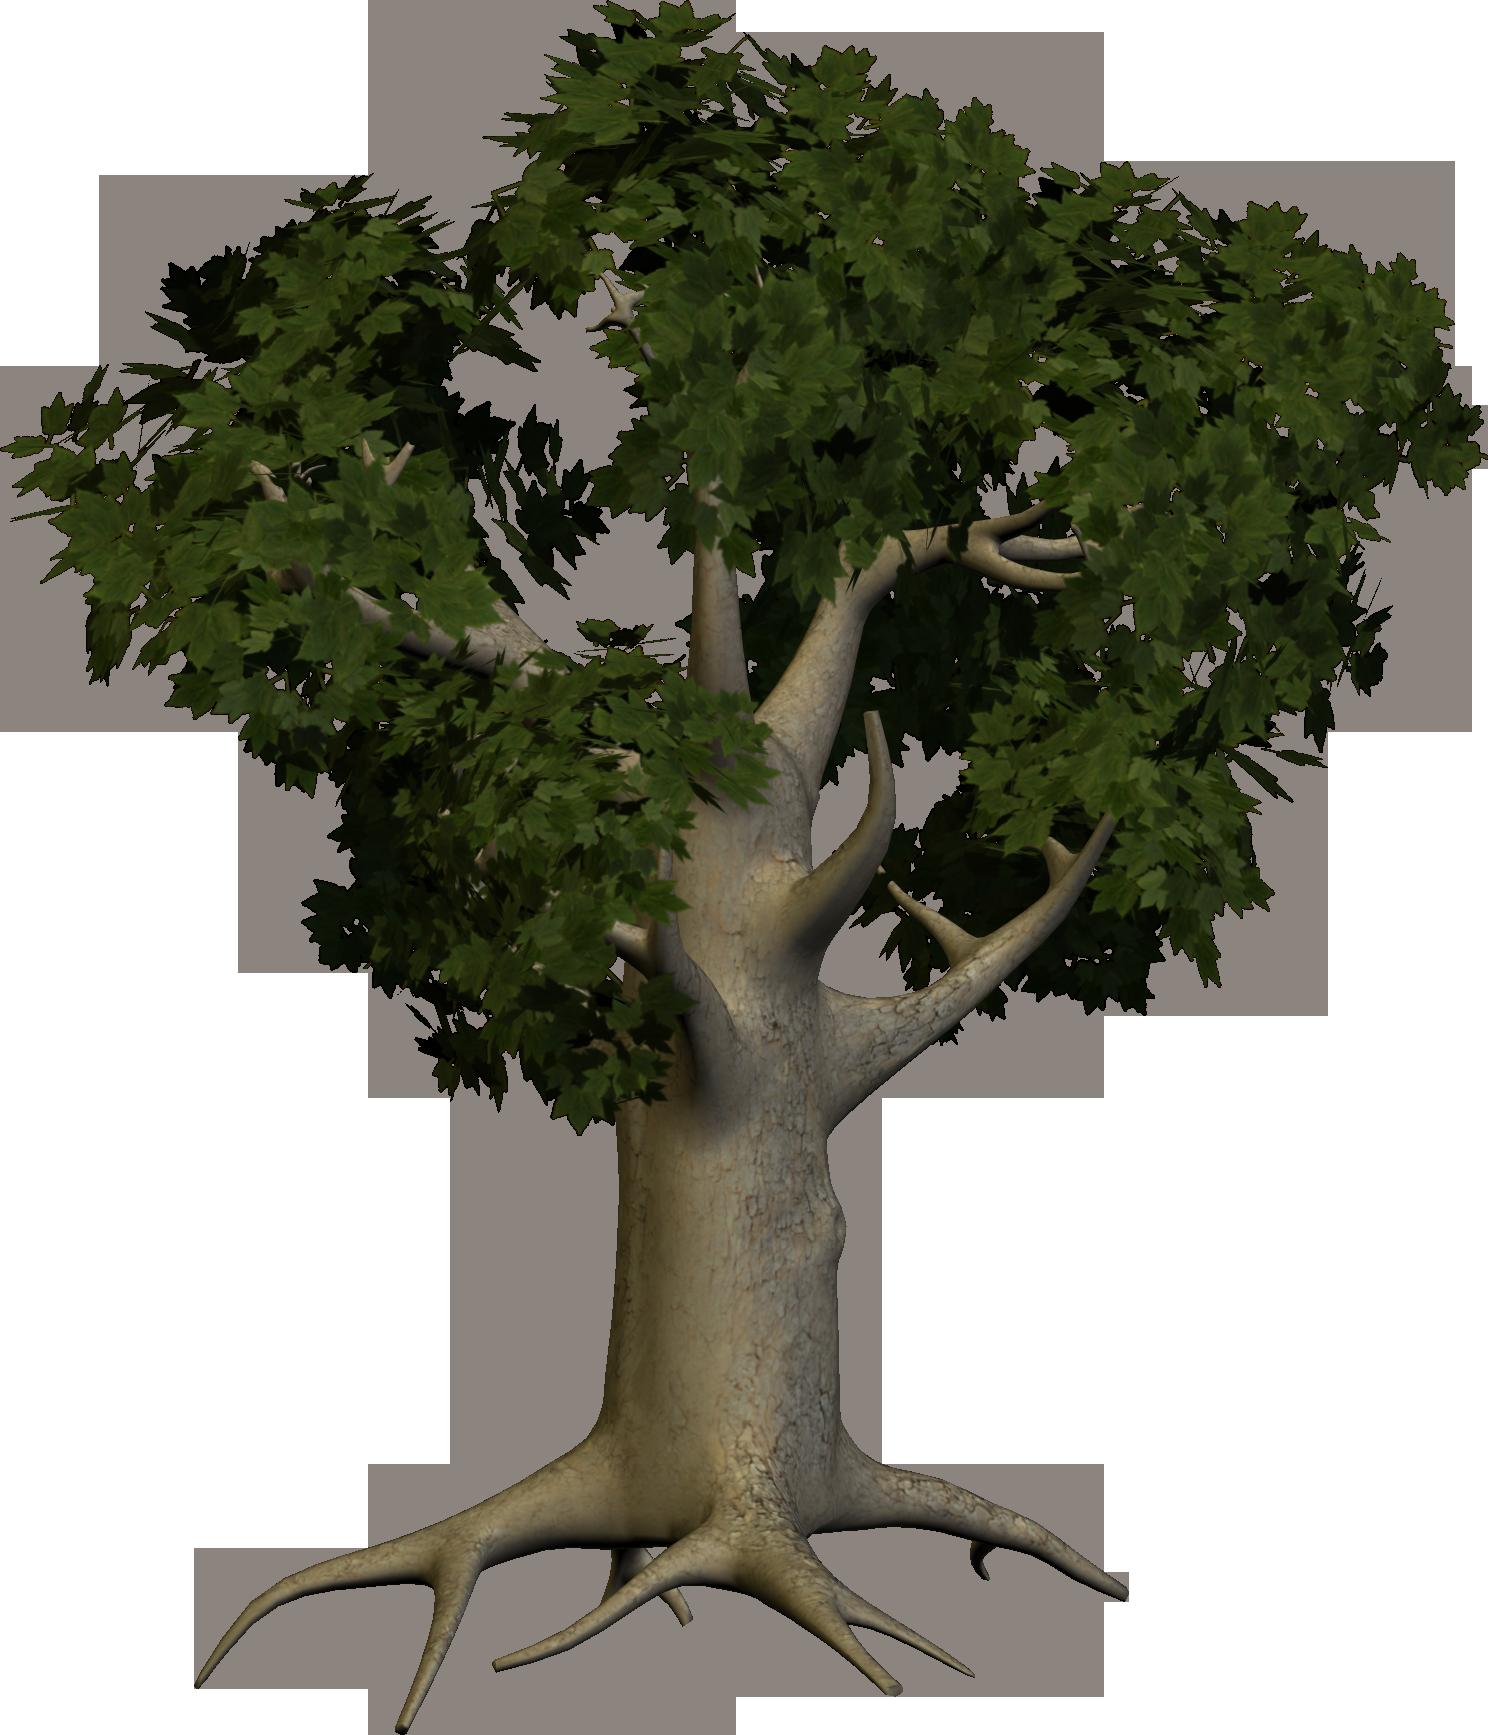 Oak Wood Tree PNG Image